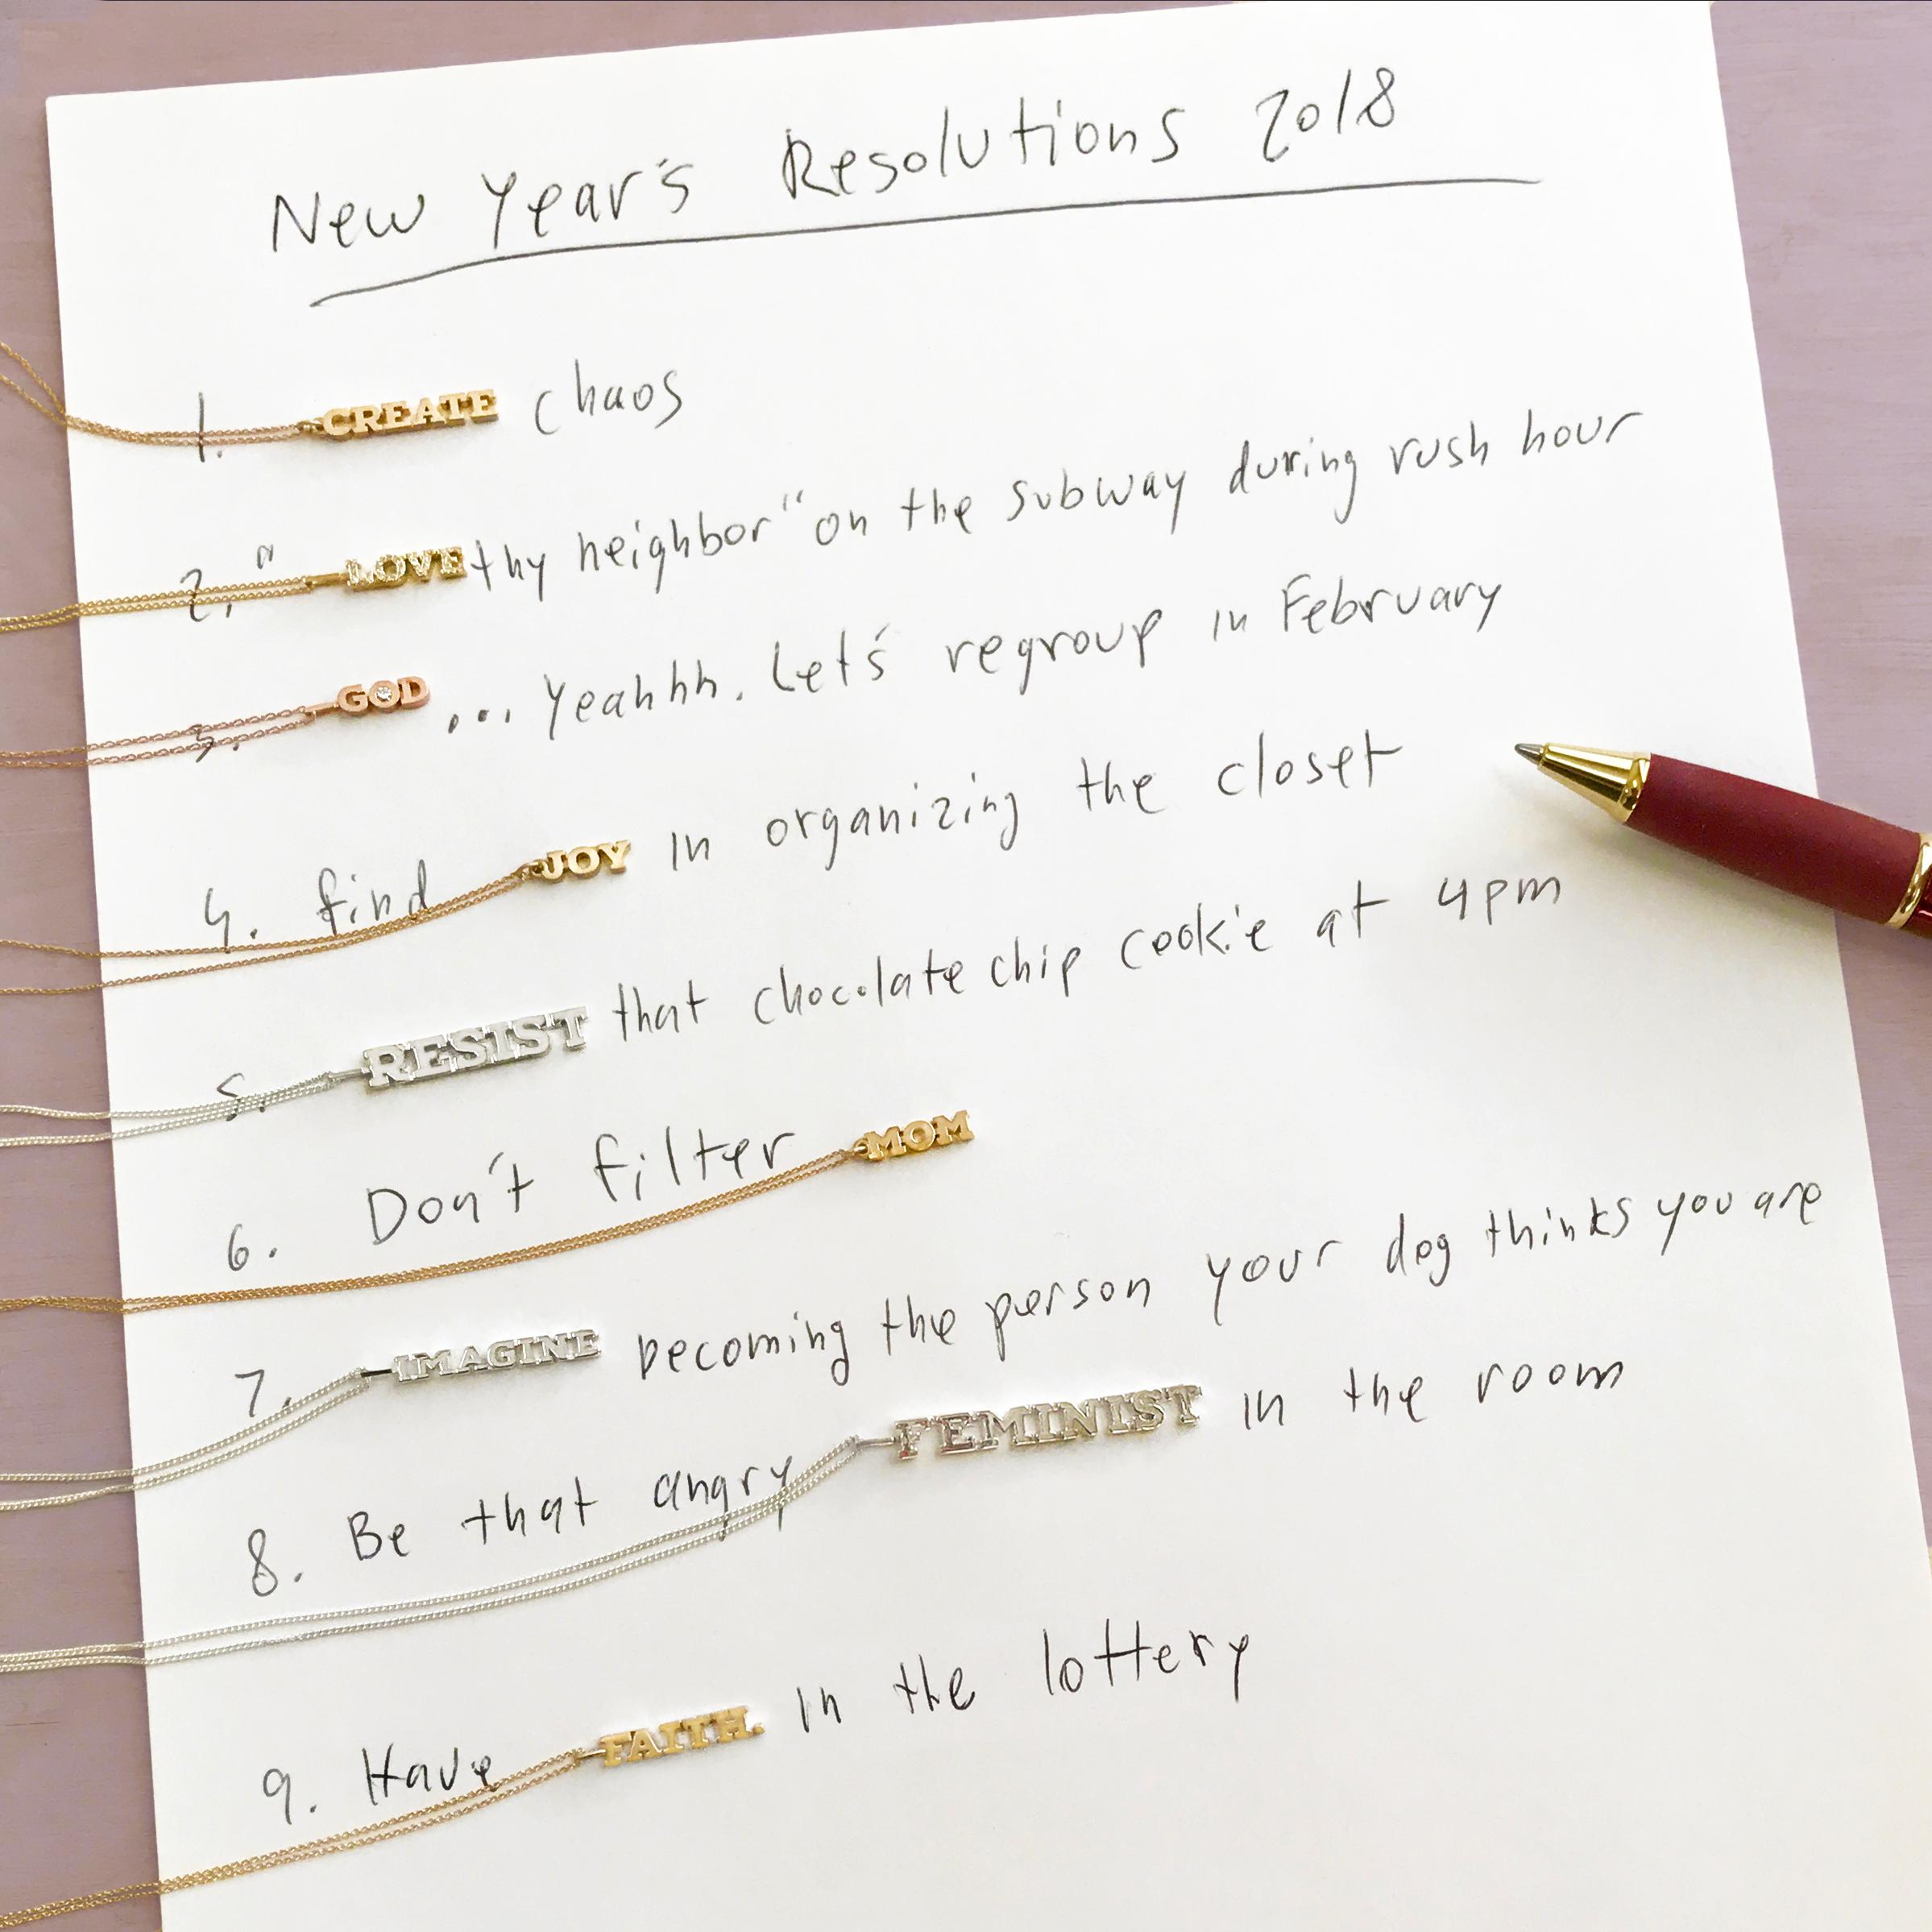 New Years Resolution List .jpg